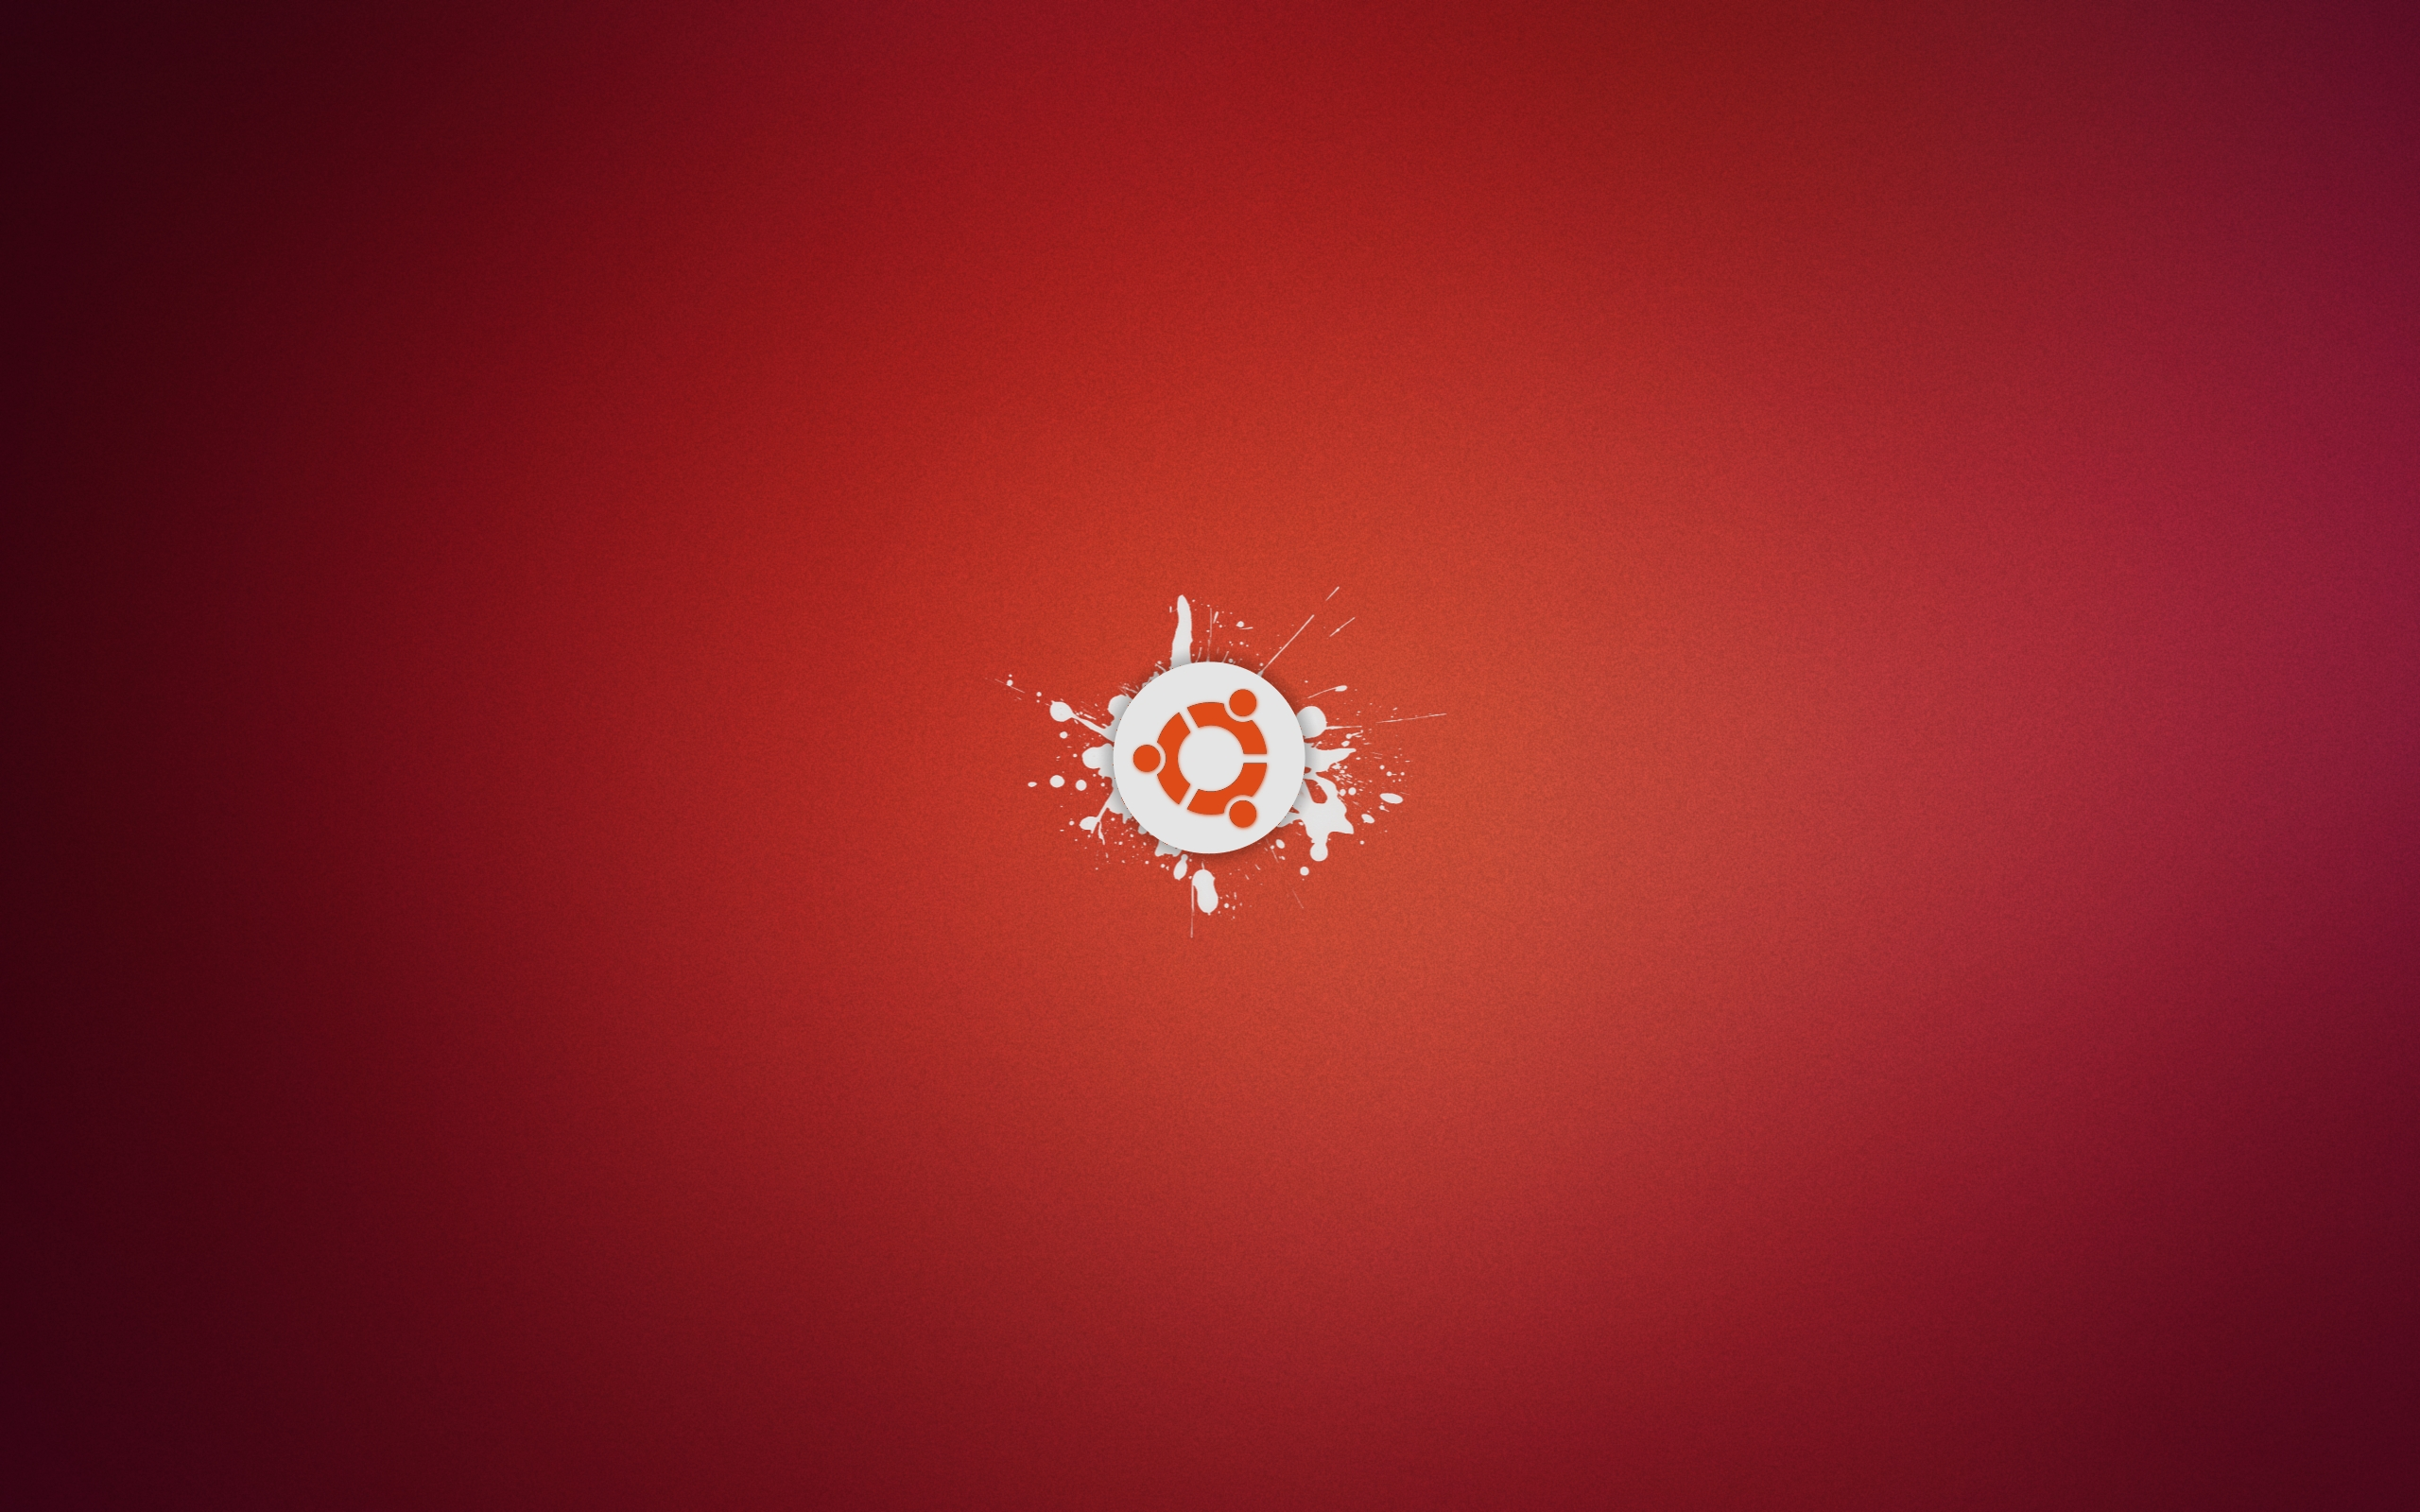 Ubuntu abstracto rojo - 2560x1600